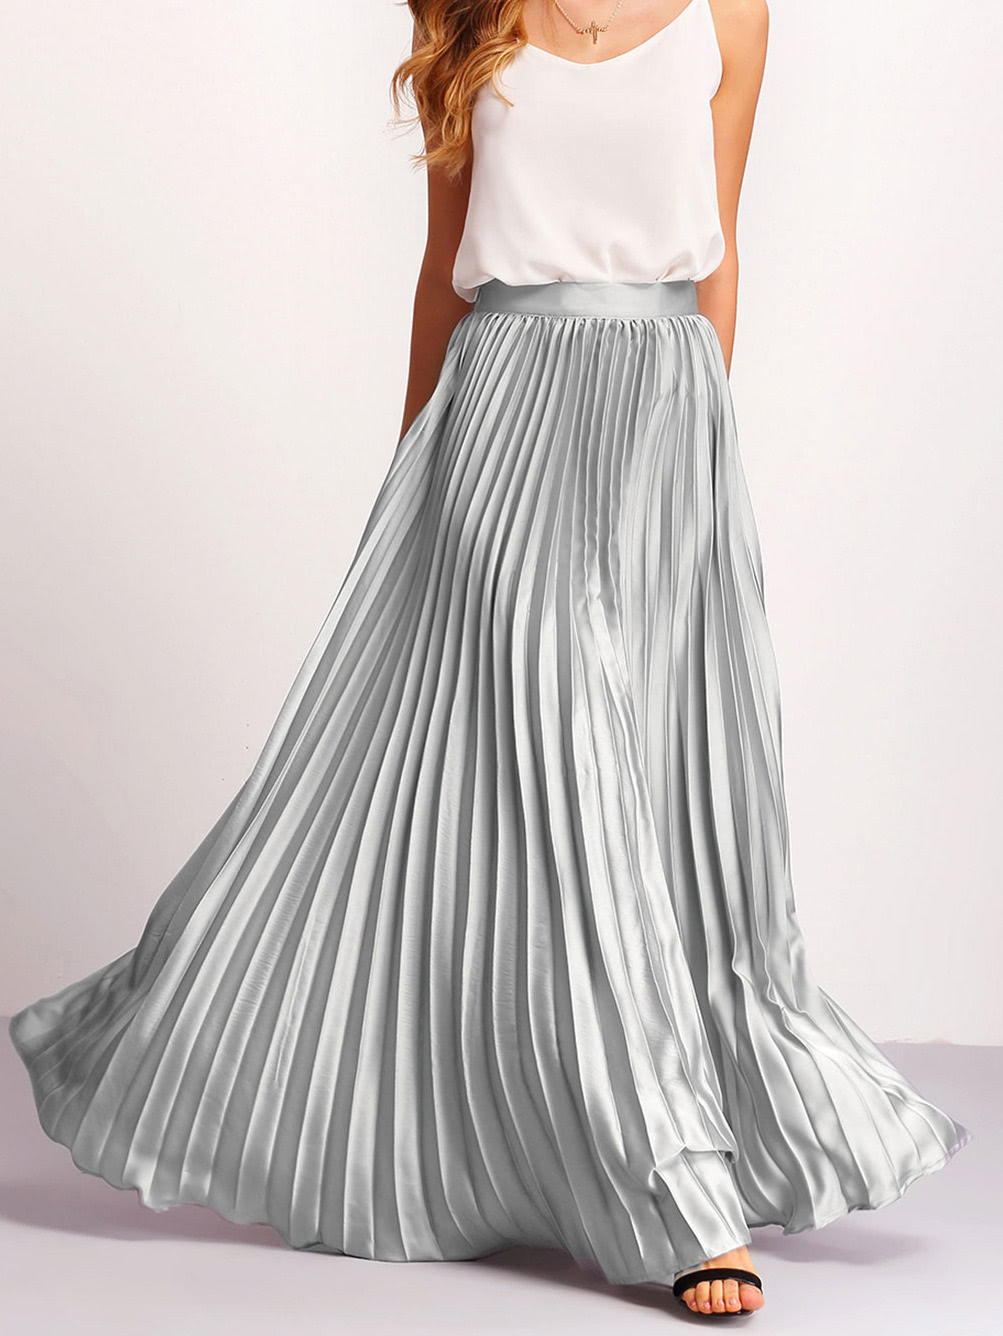 Silver Zipper Side Pleated Flare Maxi Skirt -SheIn(Sheinside)